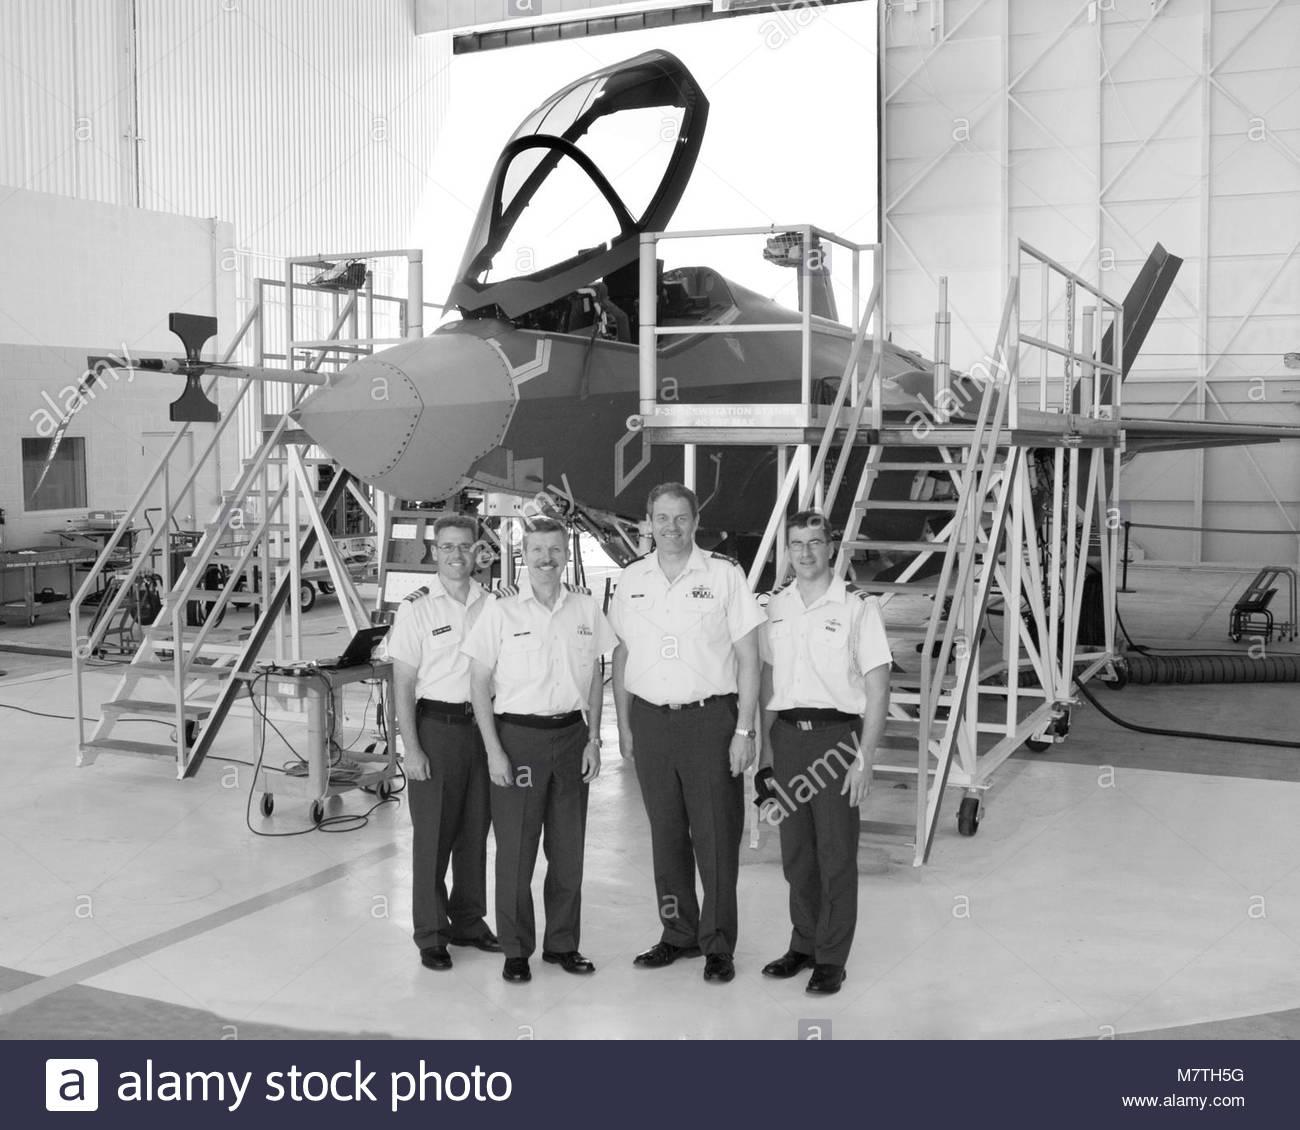 CAS Visit. 26-37098  6 September 2006 Lockheed Martin Plant, Fort Worth, Texas  Lt-General Steve Lucas, Chief Air - Stock Image